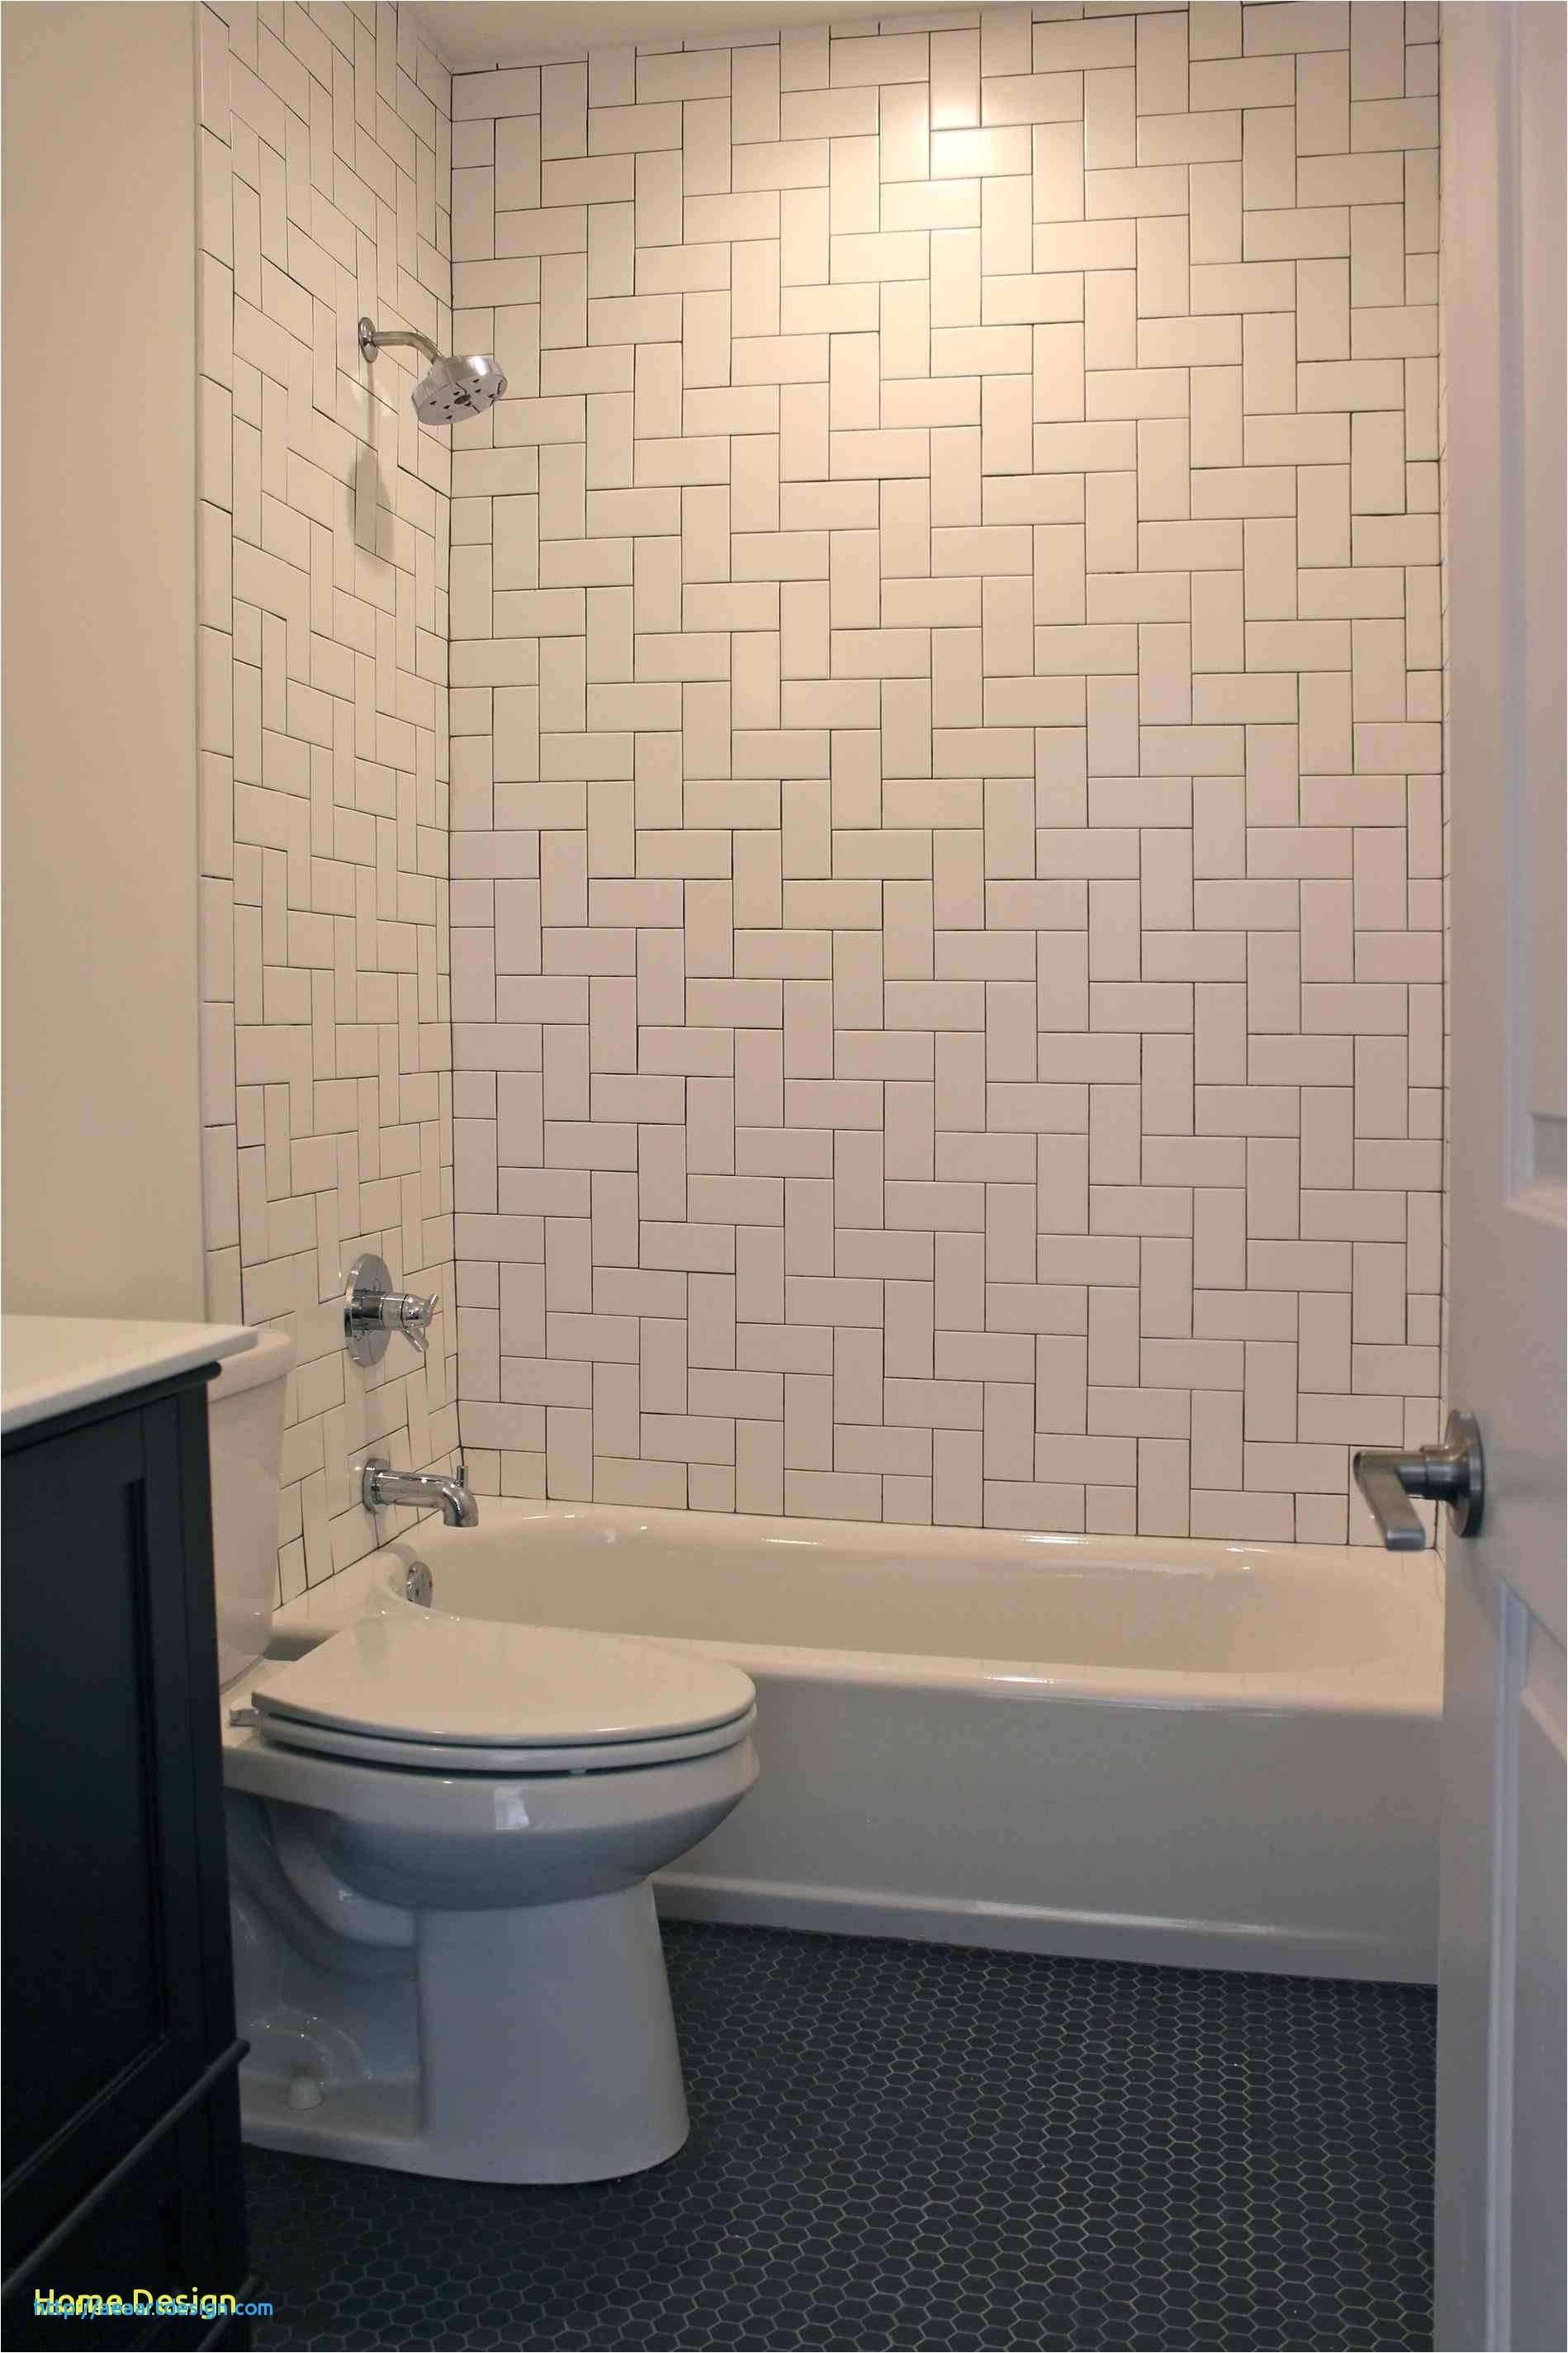 japanese bathroom design ideas elegance japanese bathroom design aeaartdesign of japanese bathroom design ideas